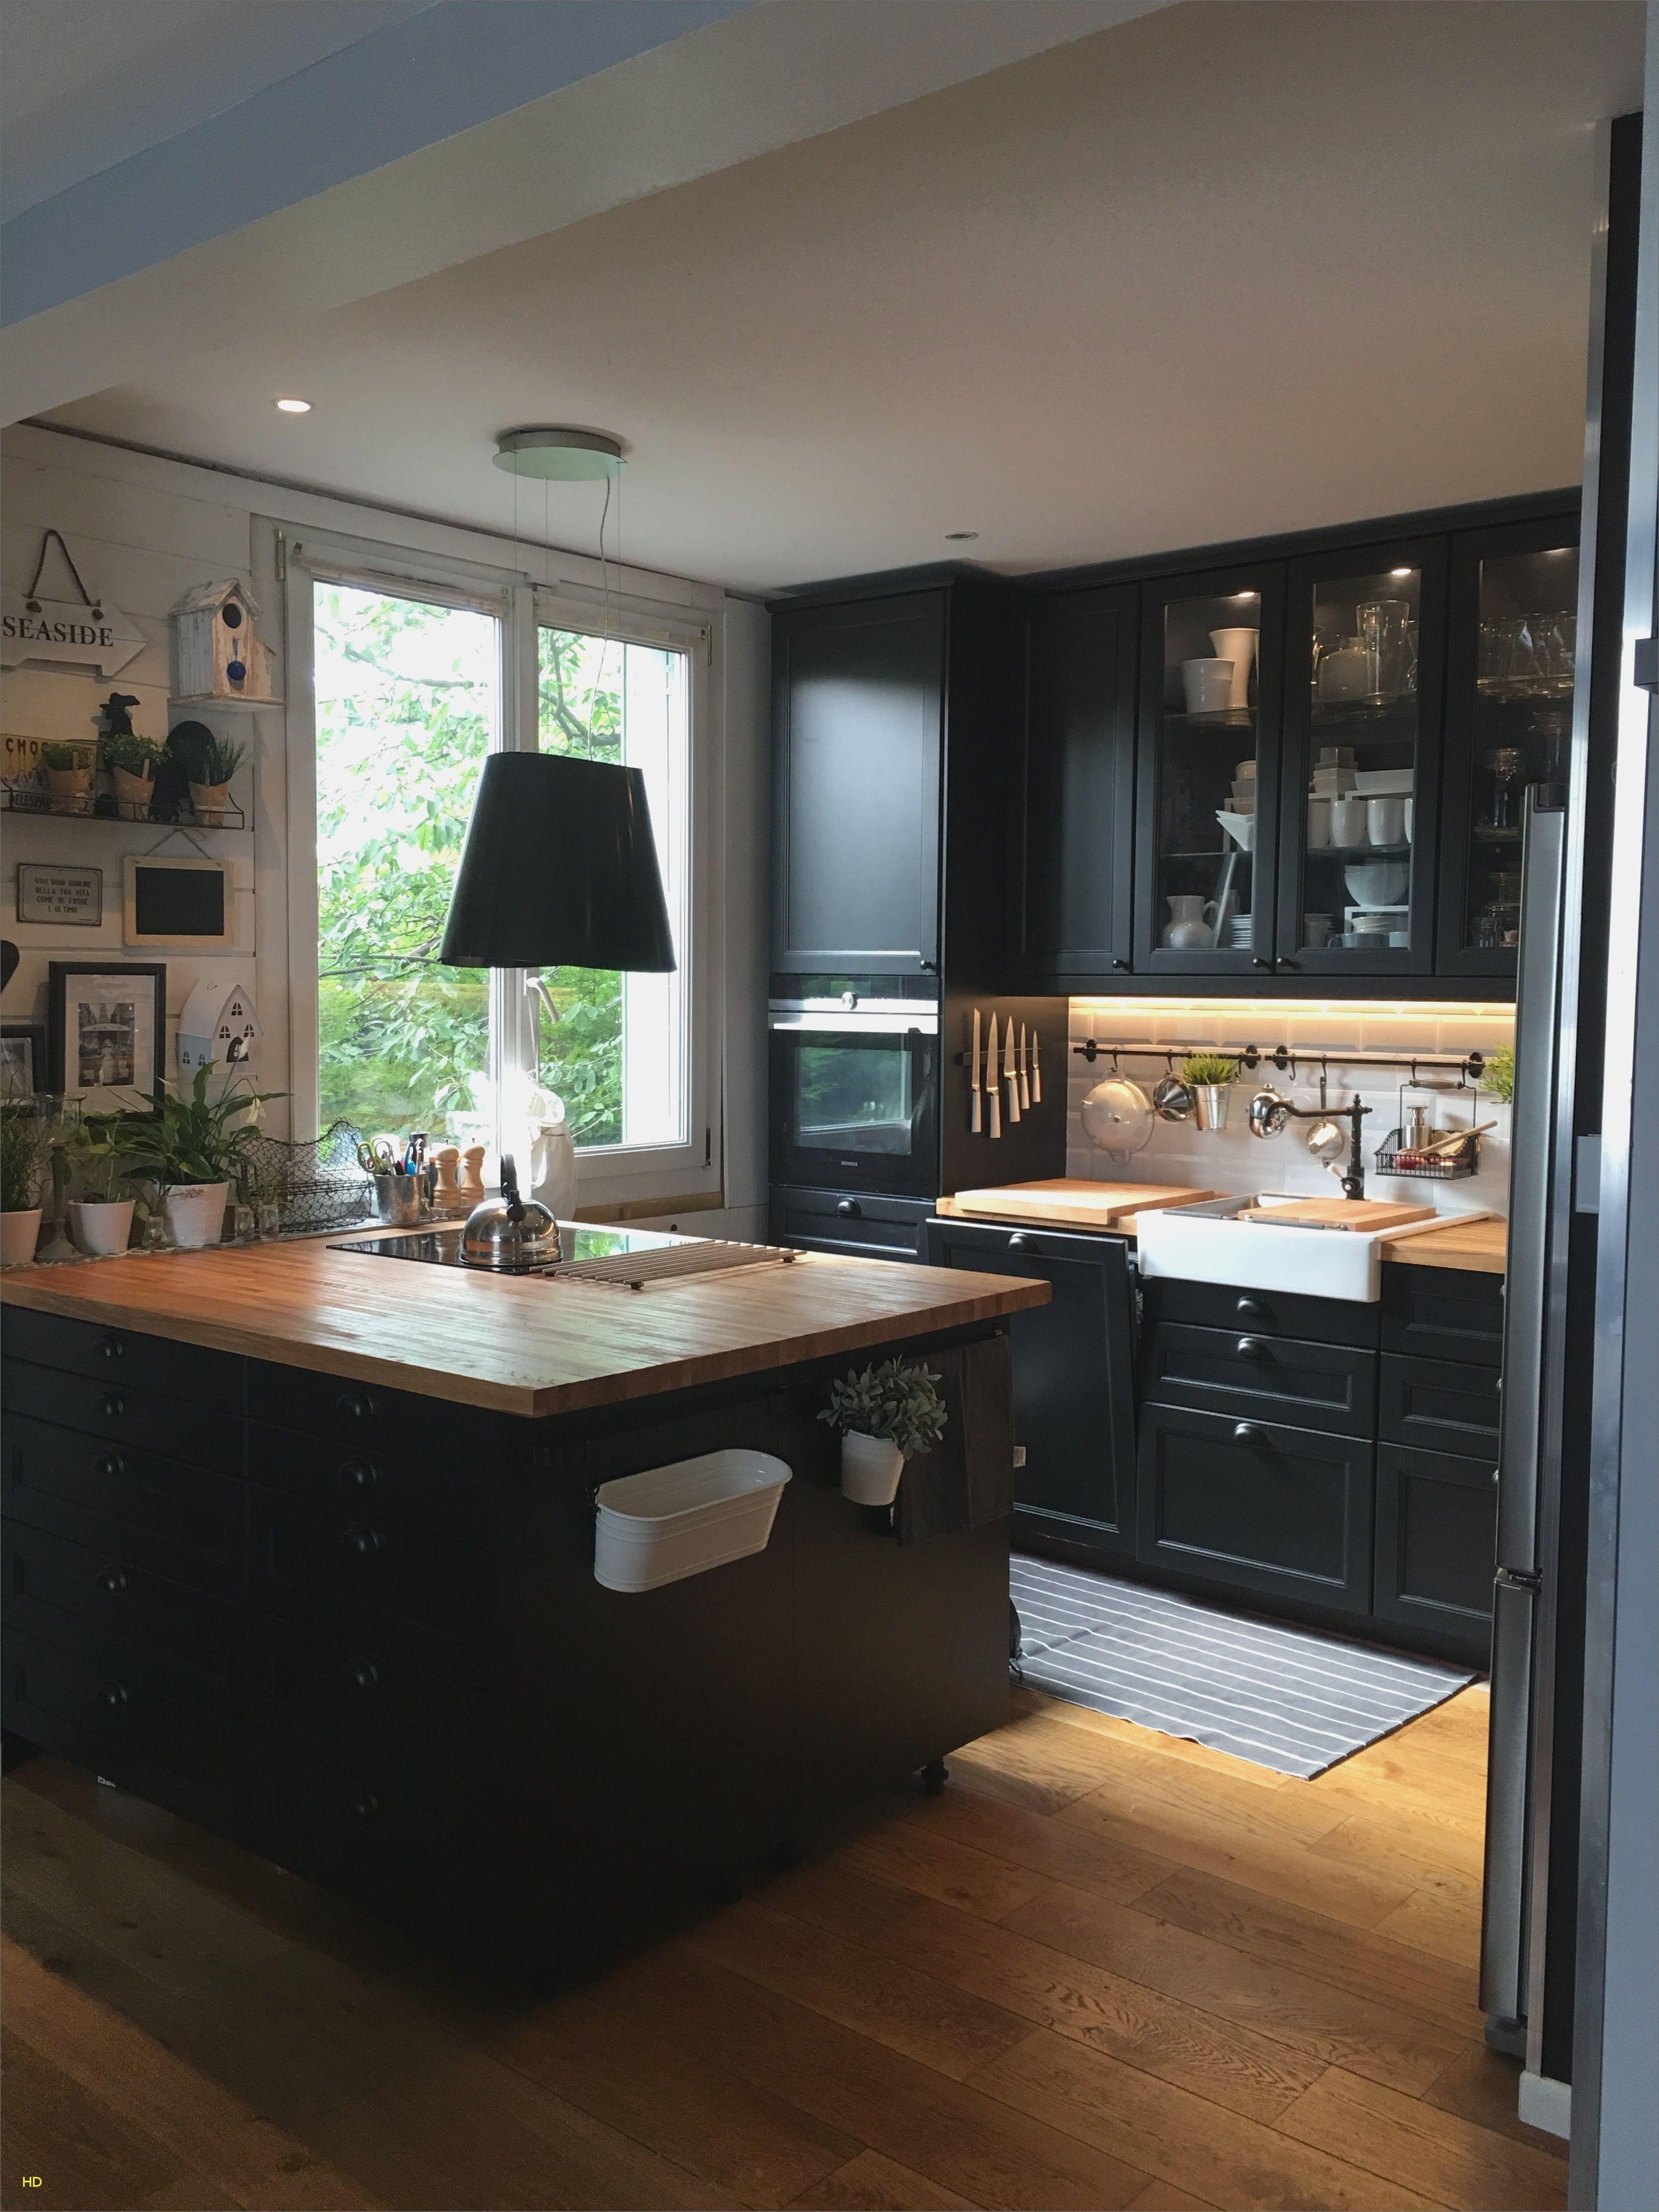 Best Of Cuisine Noir Et Plan De Travail Bois Interior Design Kitchen Kitchen Design Home Kitchens